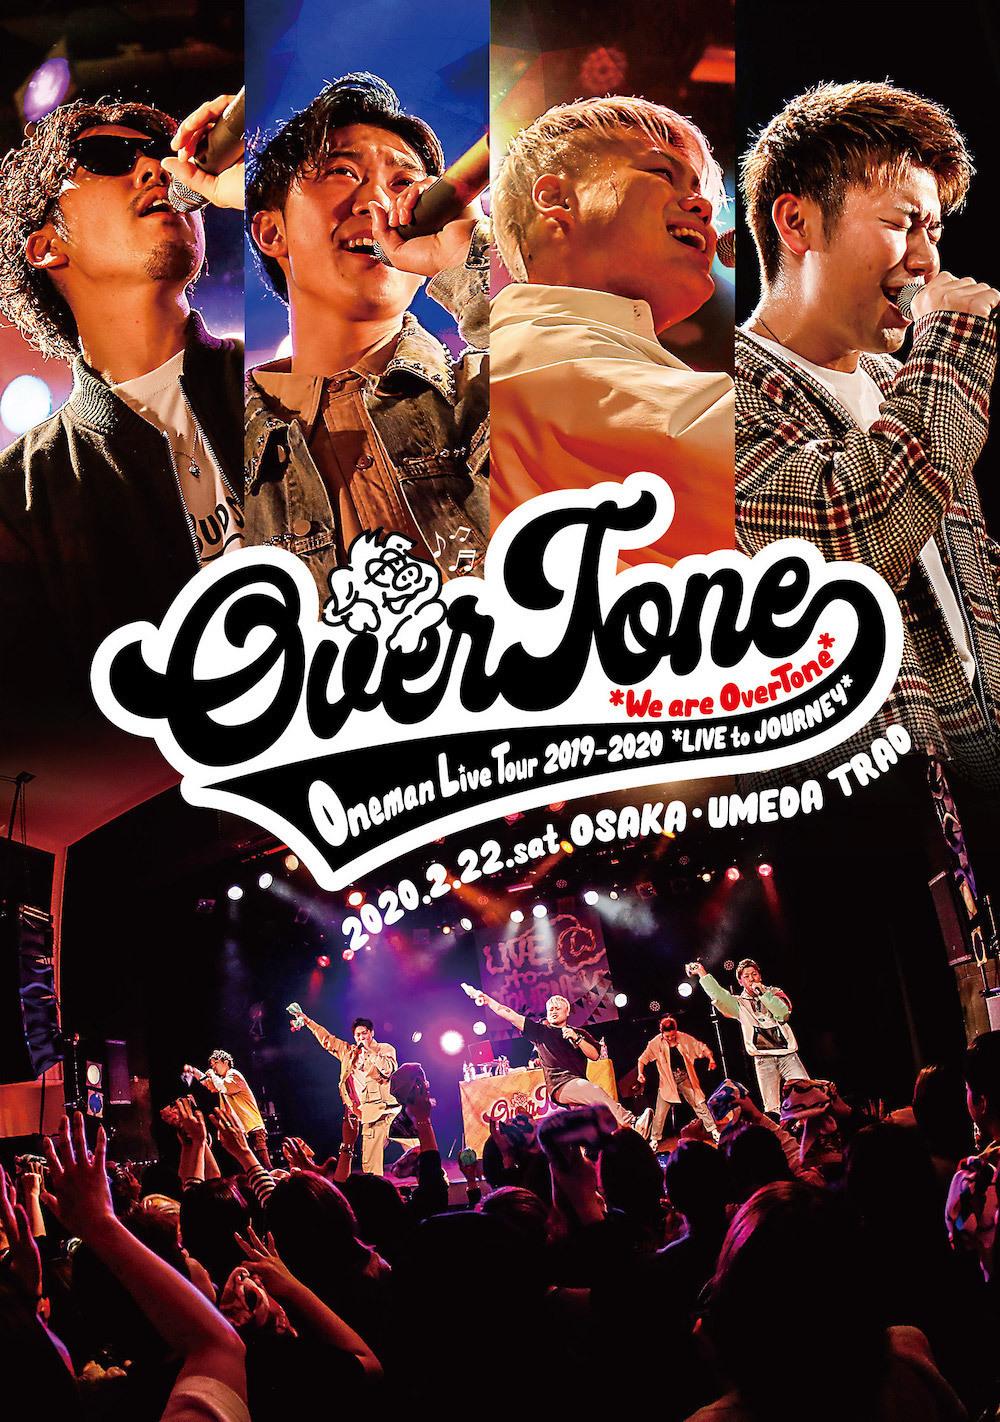 【LIVE DVD】OverTone Live Tour 2019→2020〜LIVE to JOURNEY〜@大阪umeda TRAD